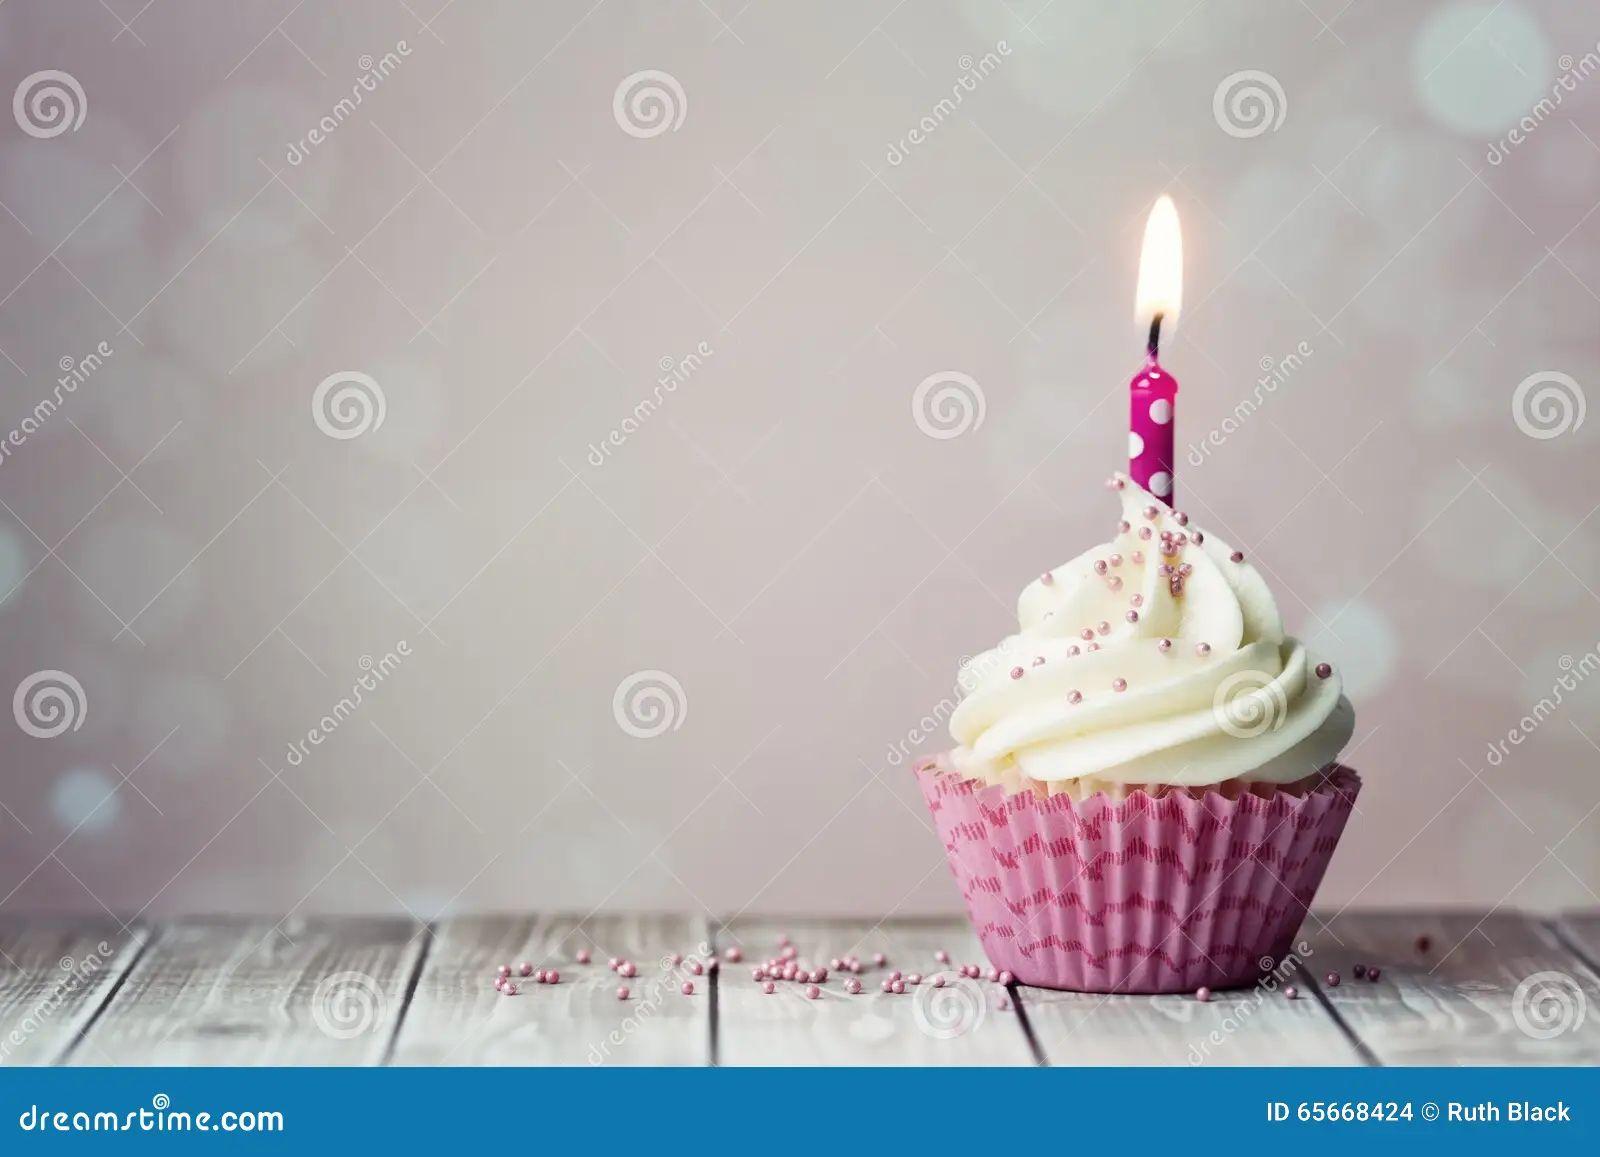 birthday cupcake background